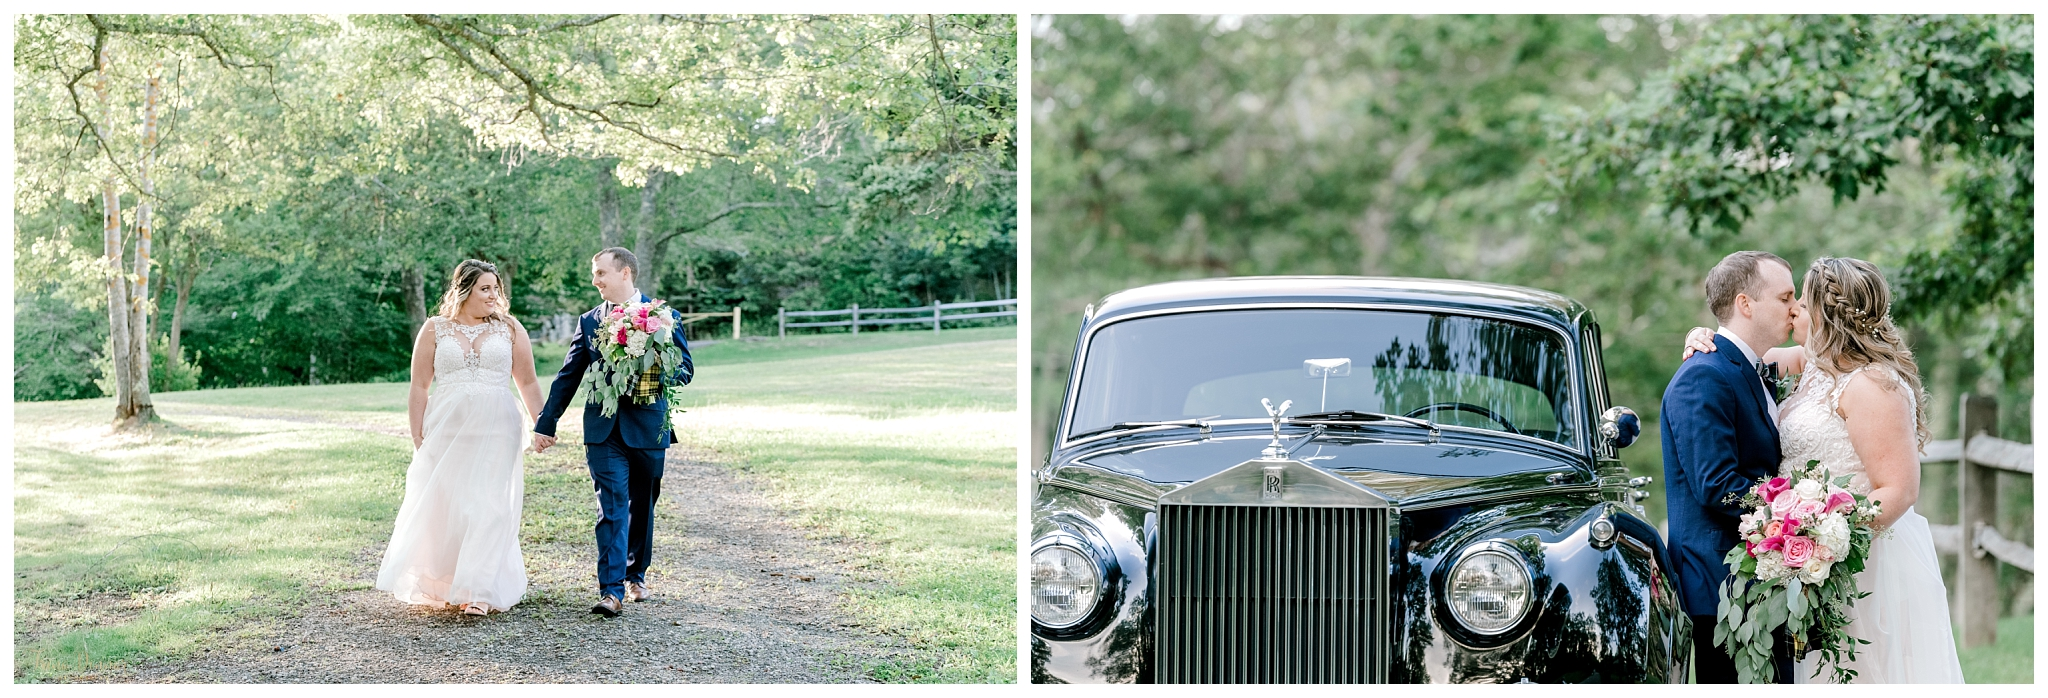 Barrett Park Boothbay Harbor Wedding Photography